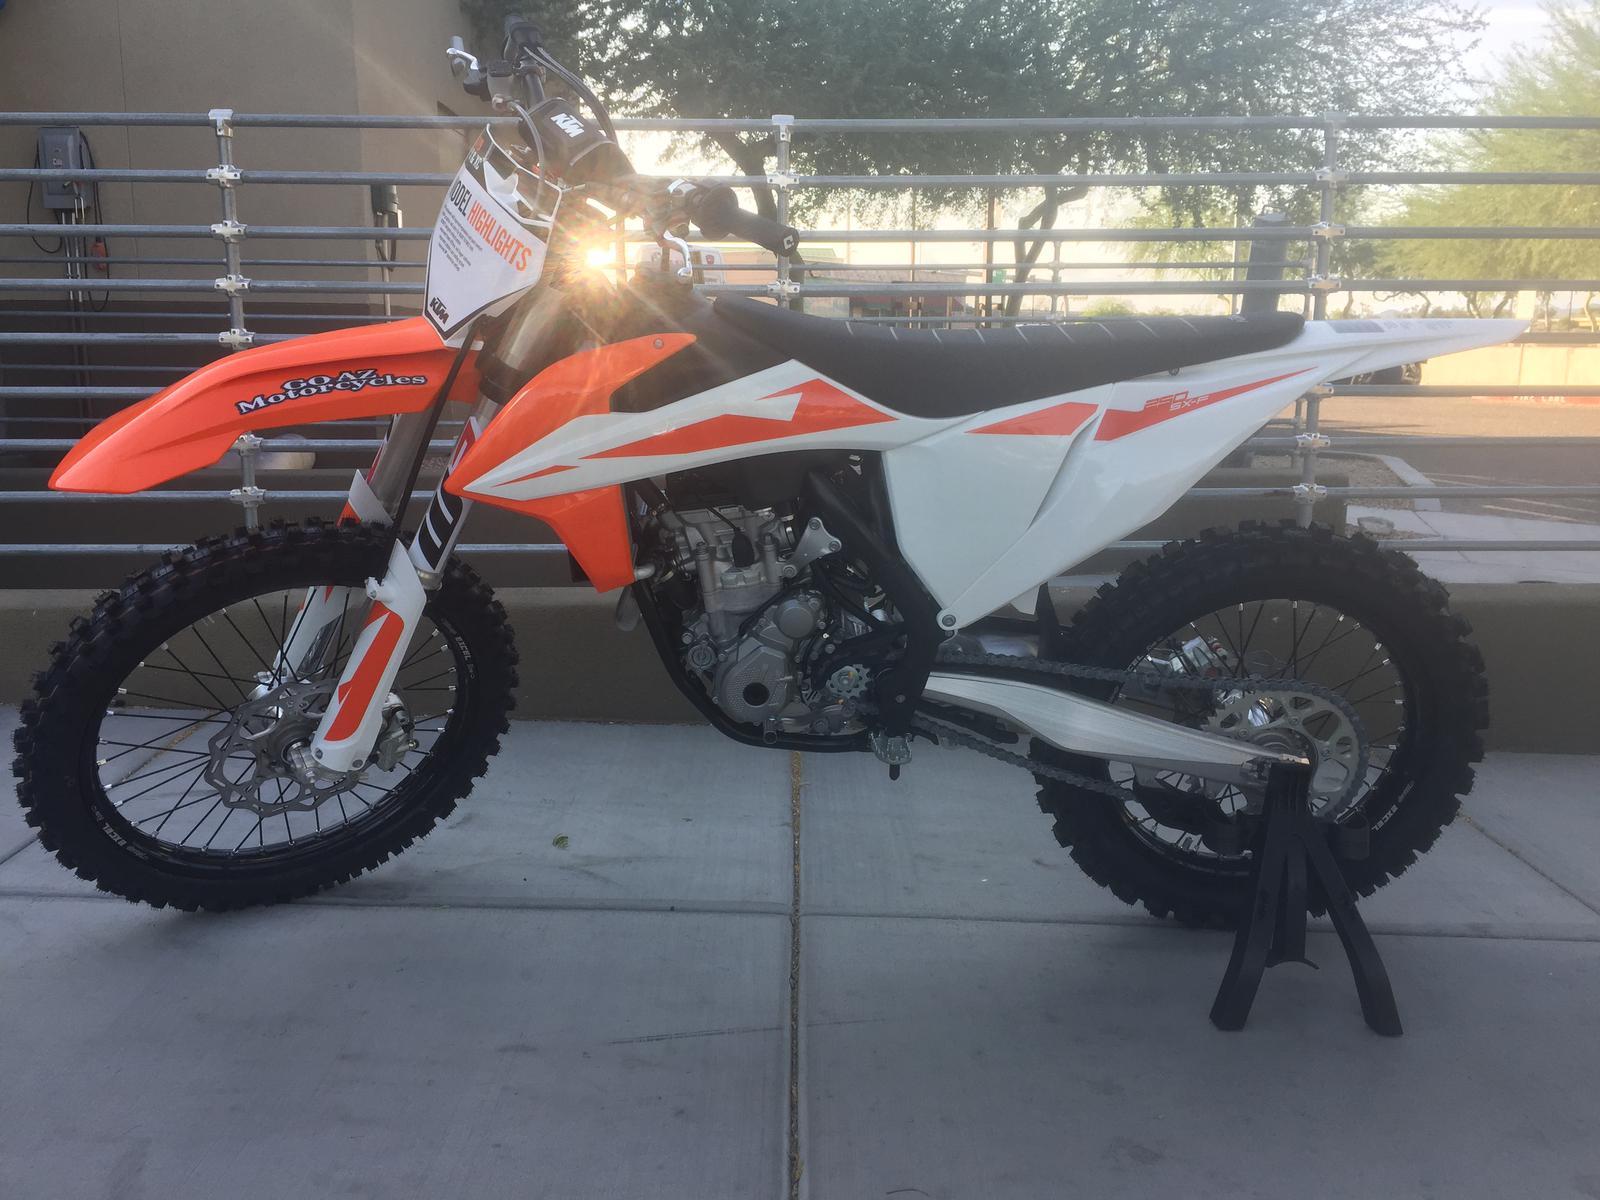 2019 ktm 250 sx f for sale in peoria az go az motorcycles in peoria 623 322 6700